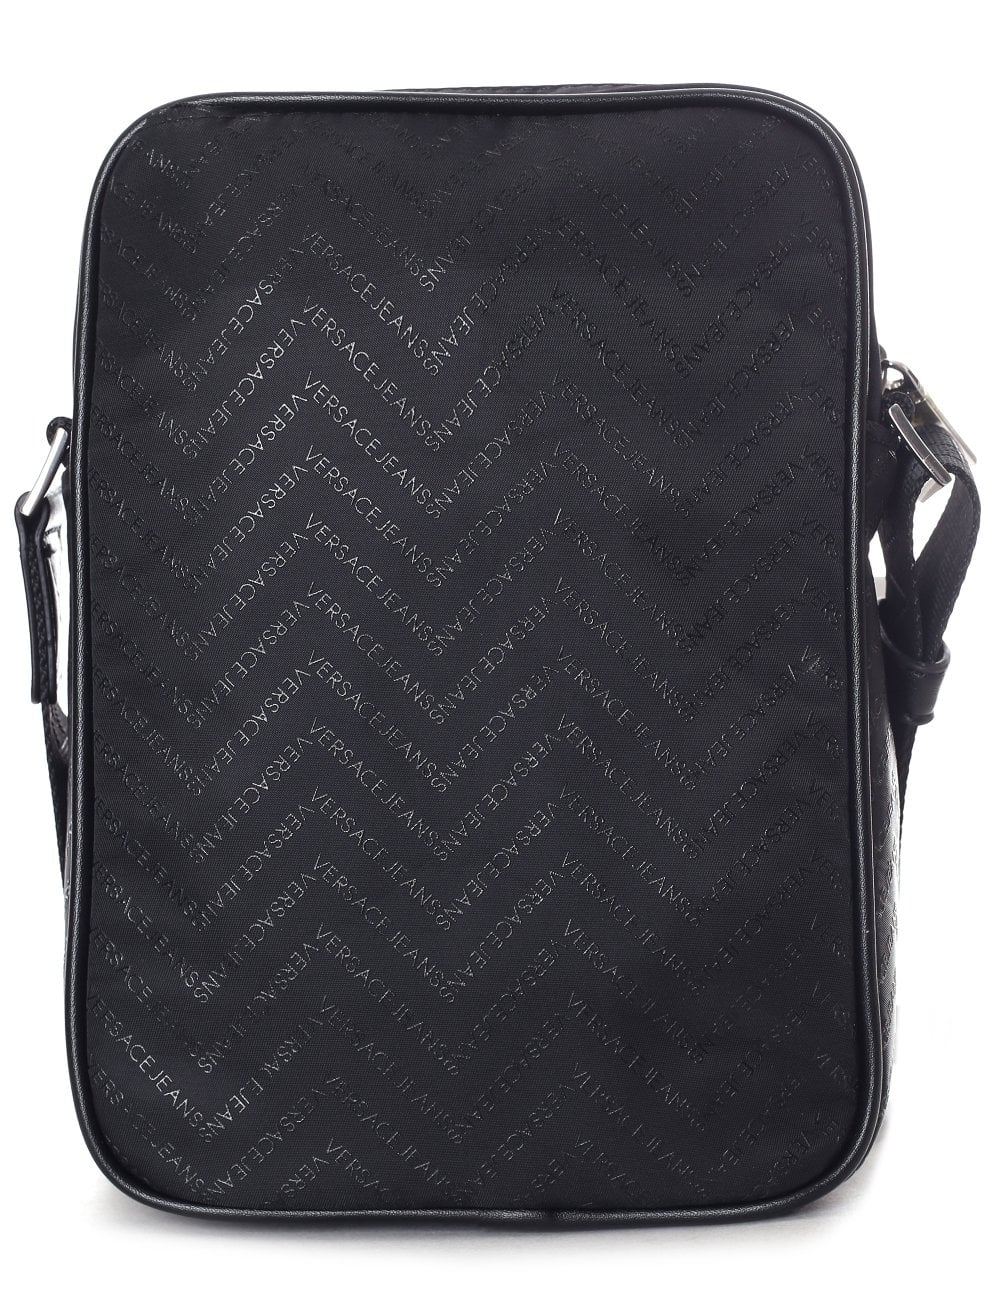 Versace Jeans Men s Chevron Cross Body Bag Black 566ea9c533